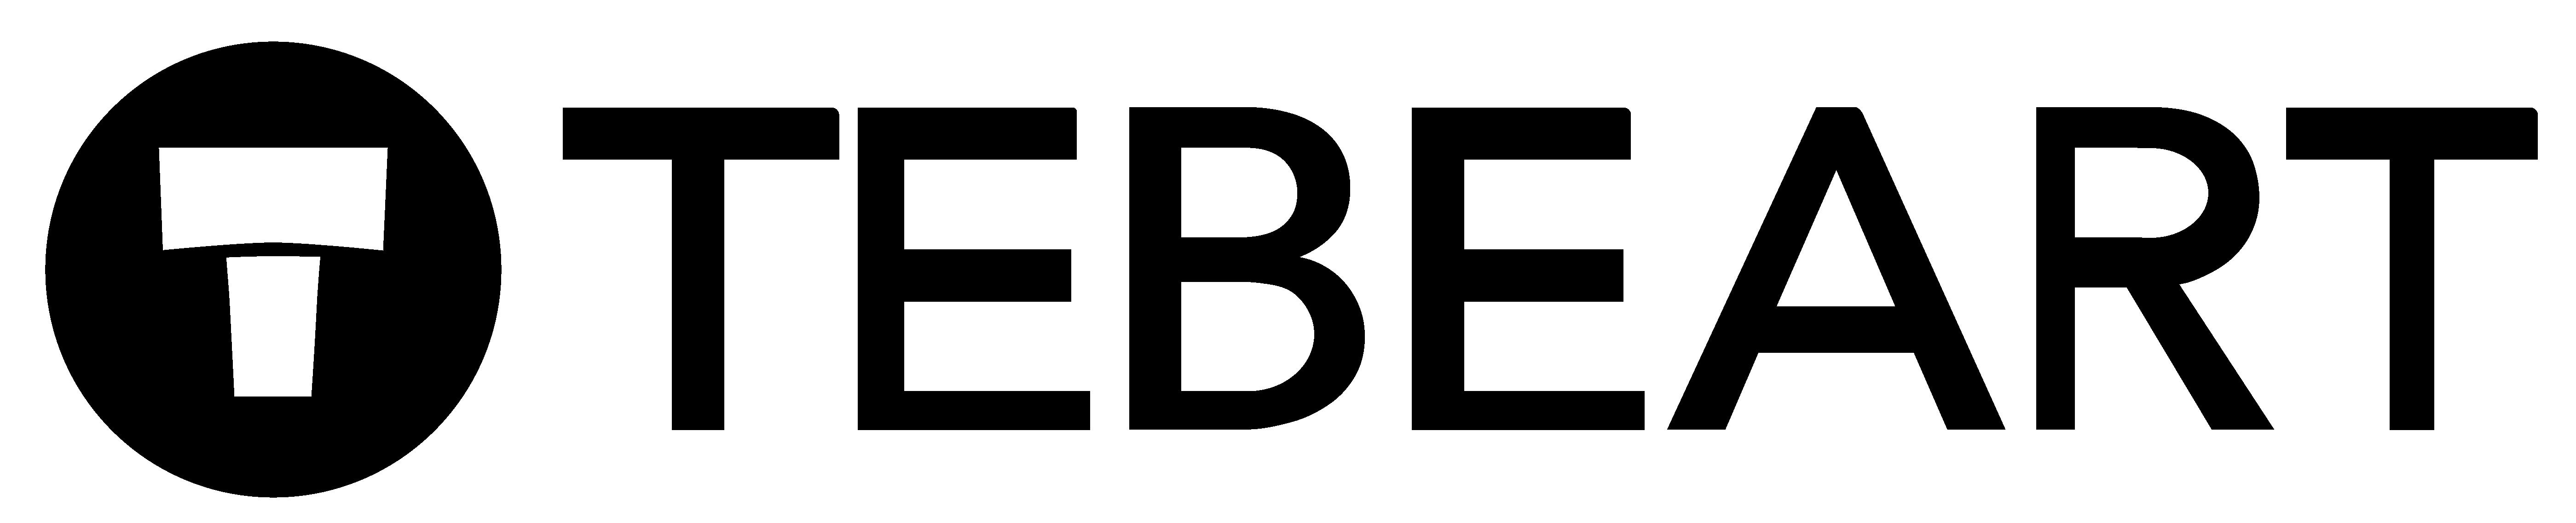 ESTEBAN SALAS